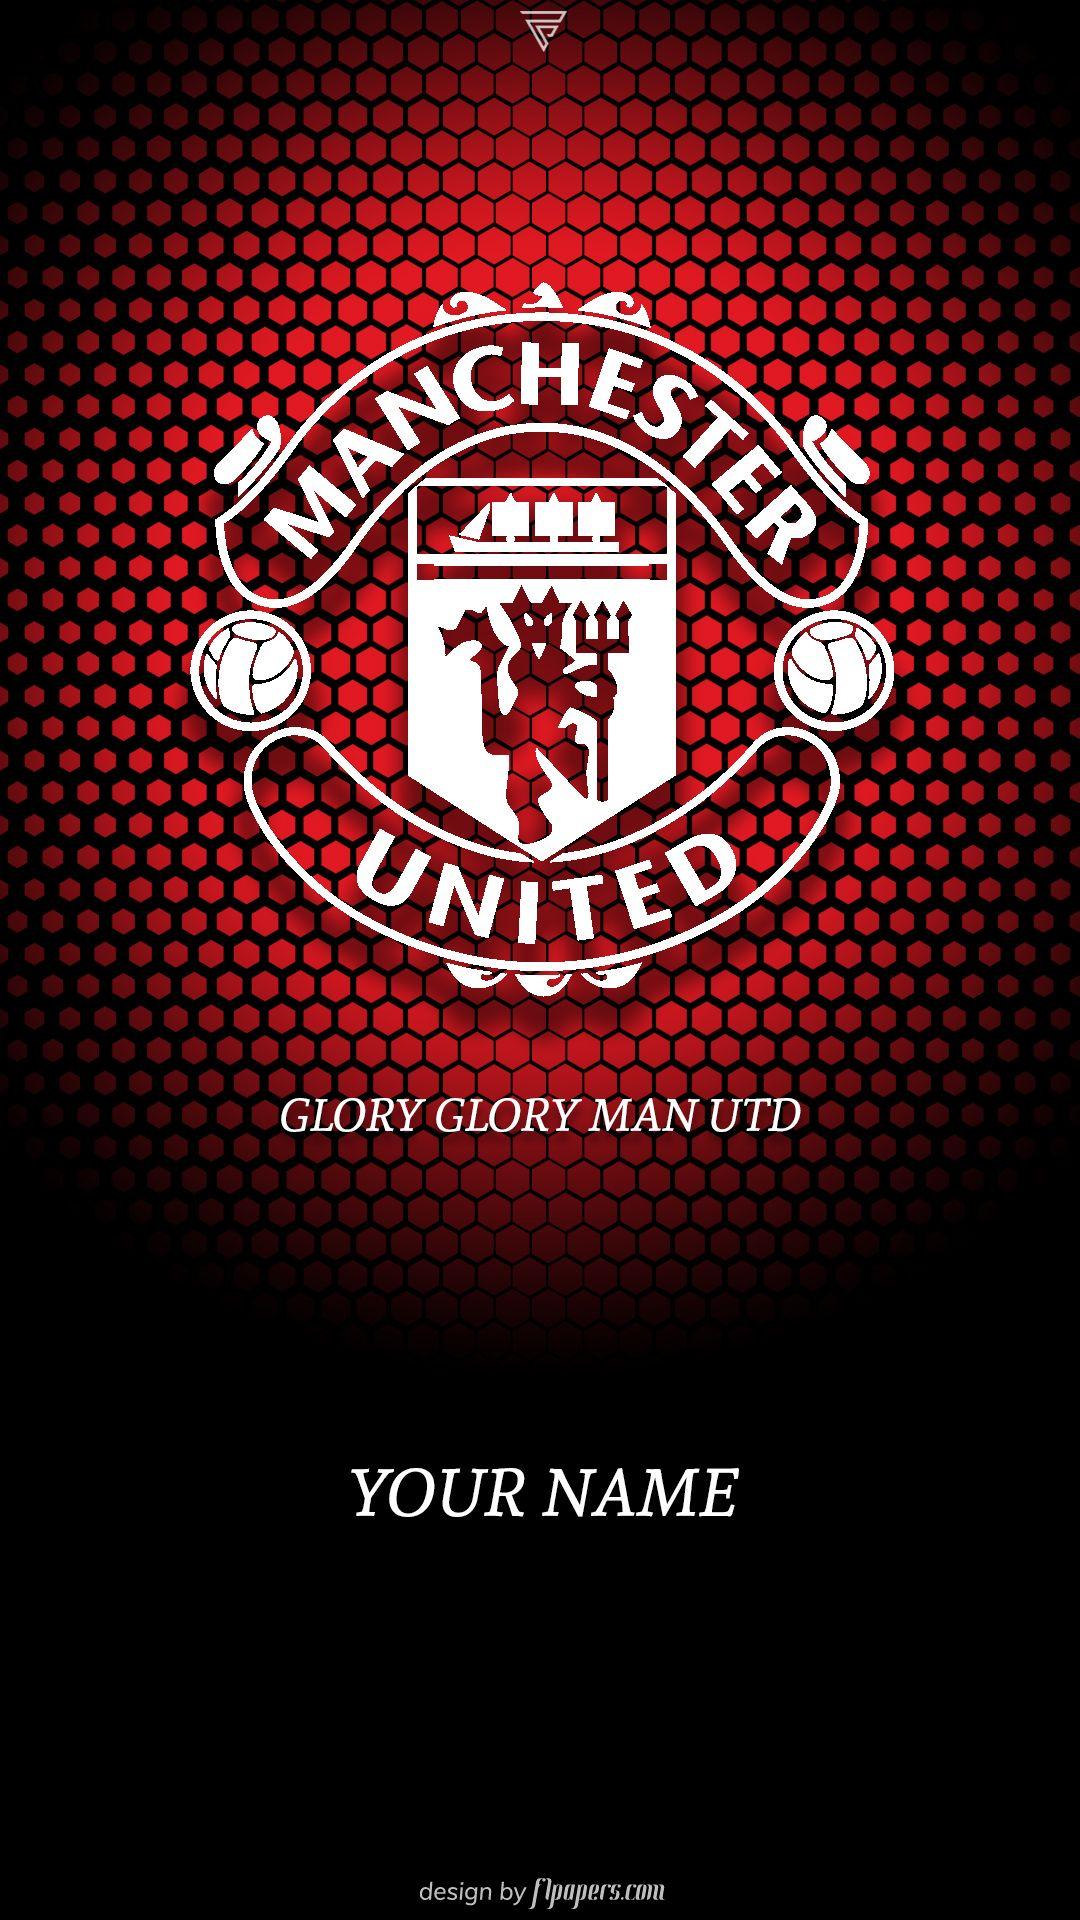 Manchester United Hd Wallpaper Manchester United Logo Manchester United Manchester United Art